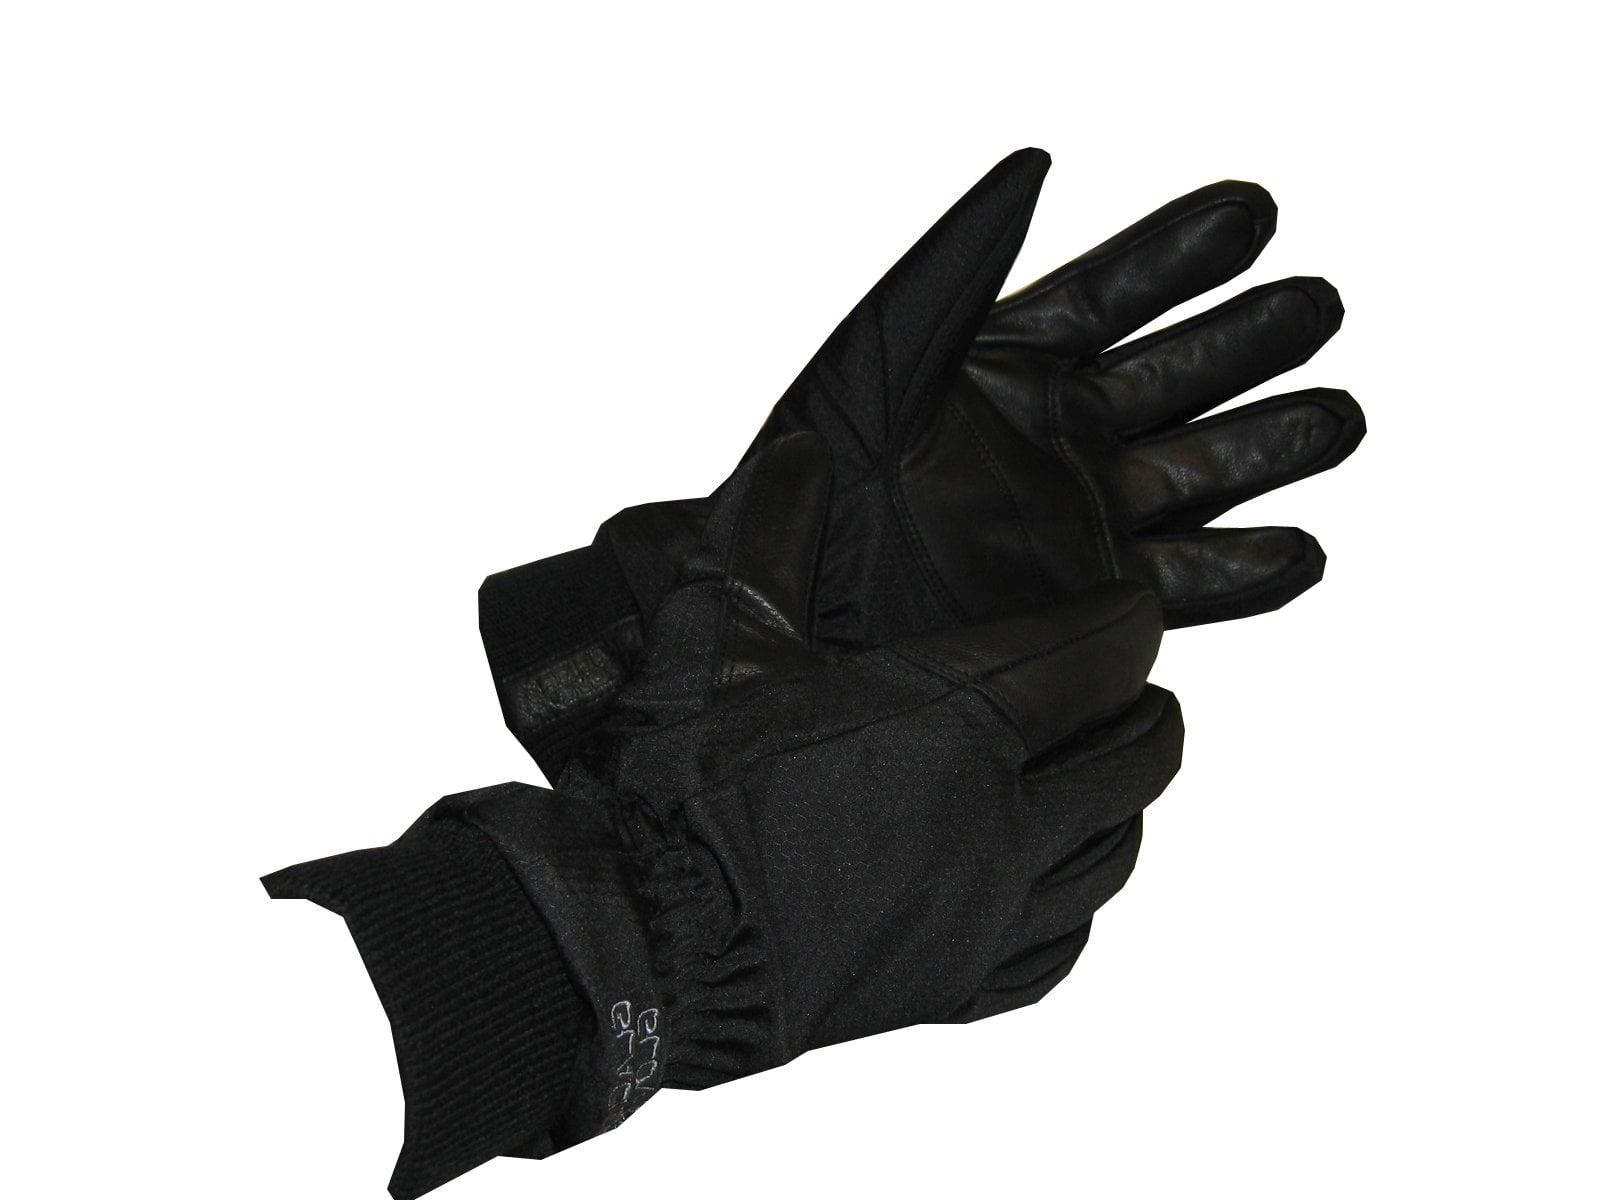 Glacier Glove Alaska Waterproof Insulated Glove 775BK-M by Insulated Gloves